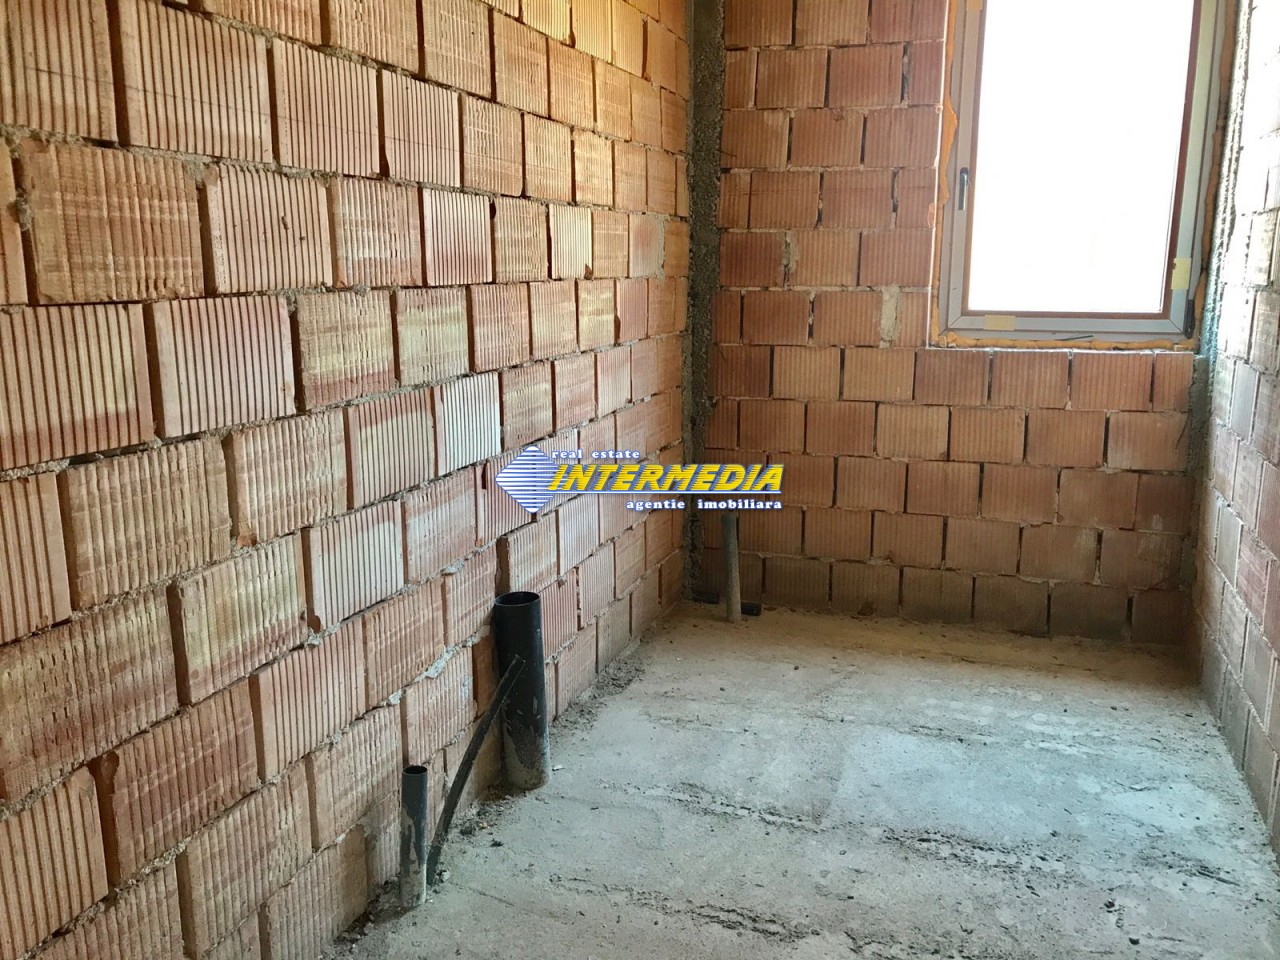 Casa in rosu de vanzare Alba Iulia cu utilitati-22465-16